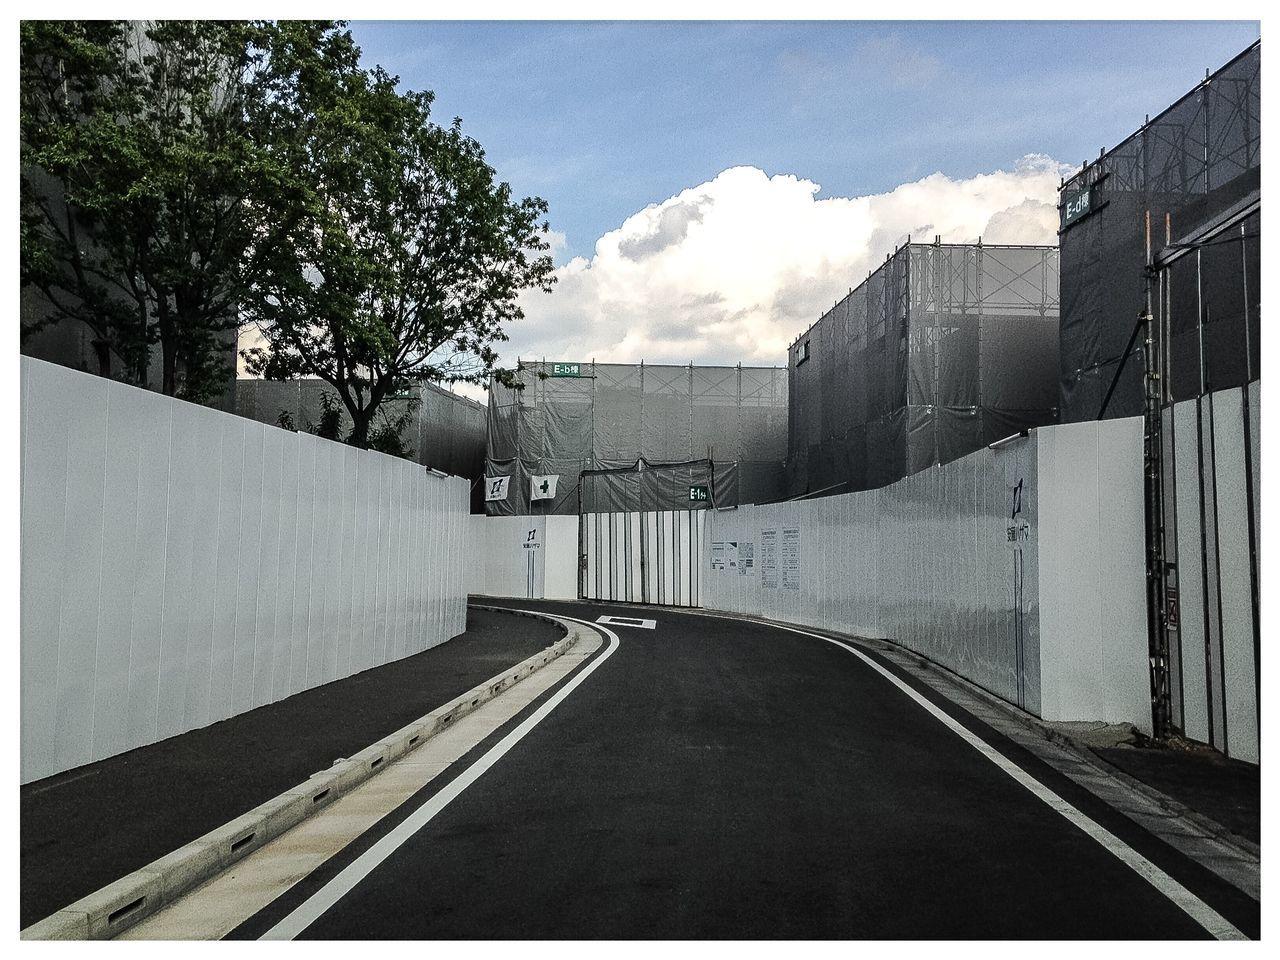 Street Amidst Under Construction Buildings Against Sky